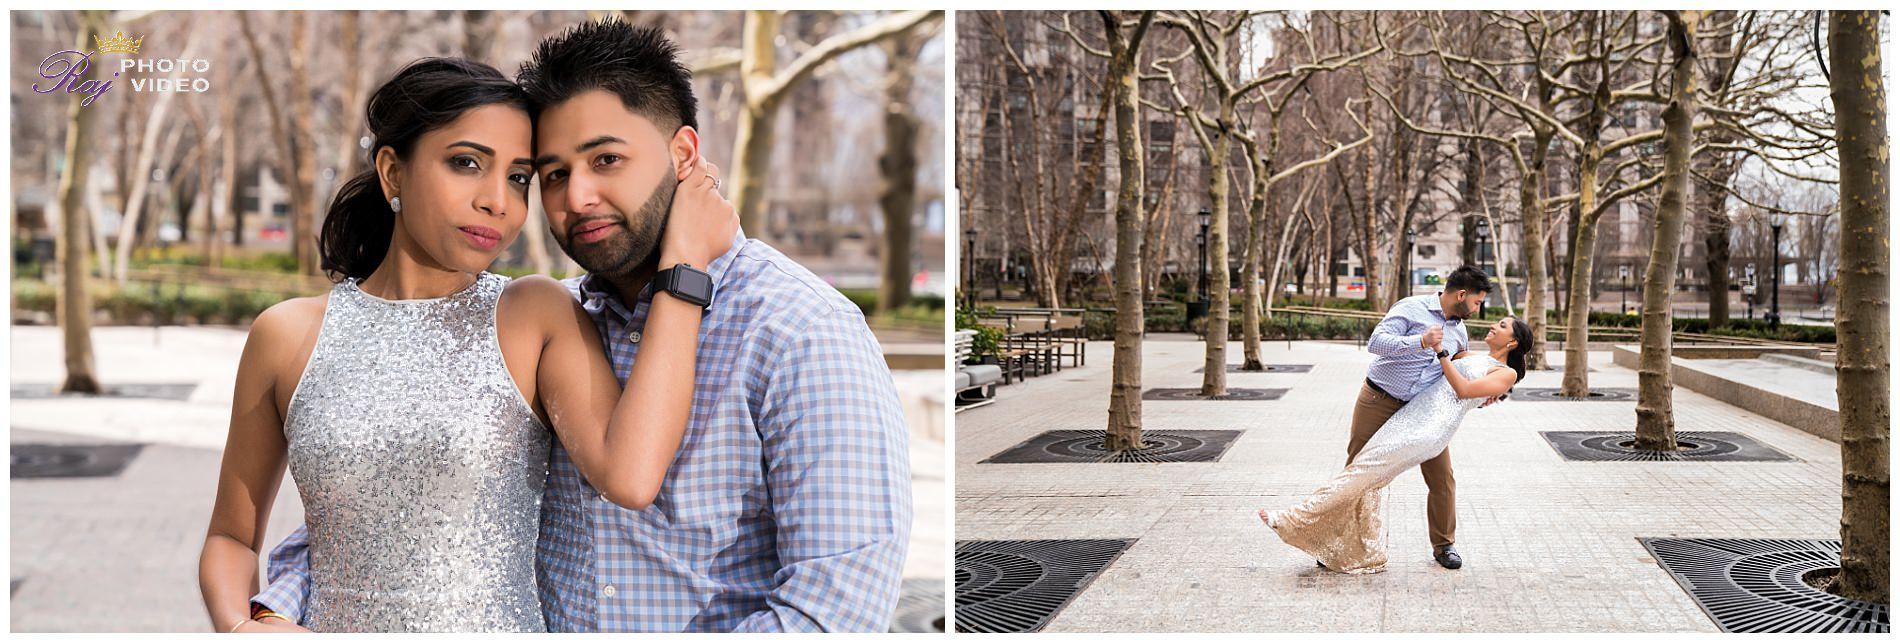 The-Oculus-Brookfield-Place-Downtown-Manhattan-Engagement-Shoot-Nidhi-Rudra-00016.jpg